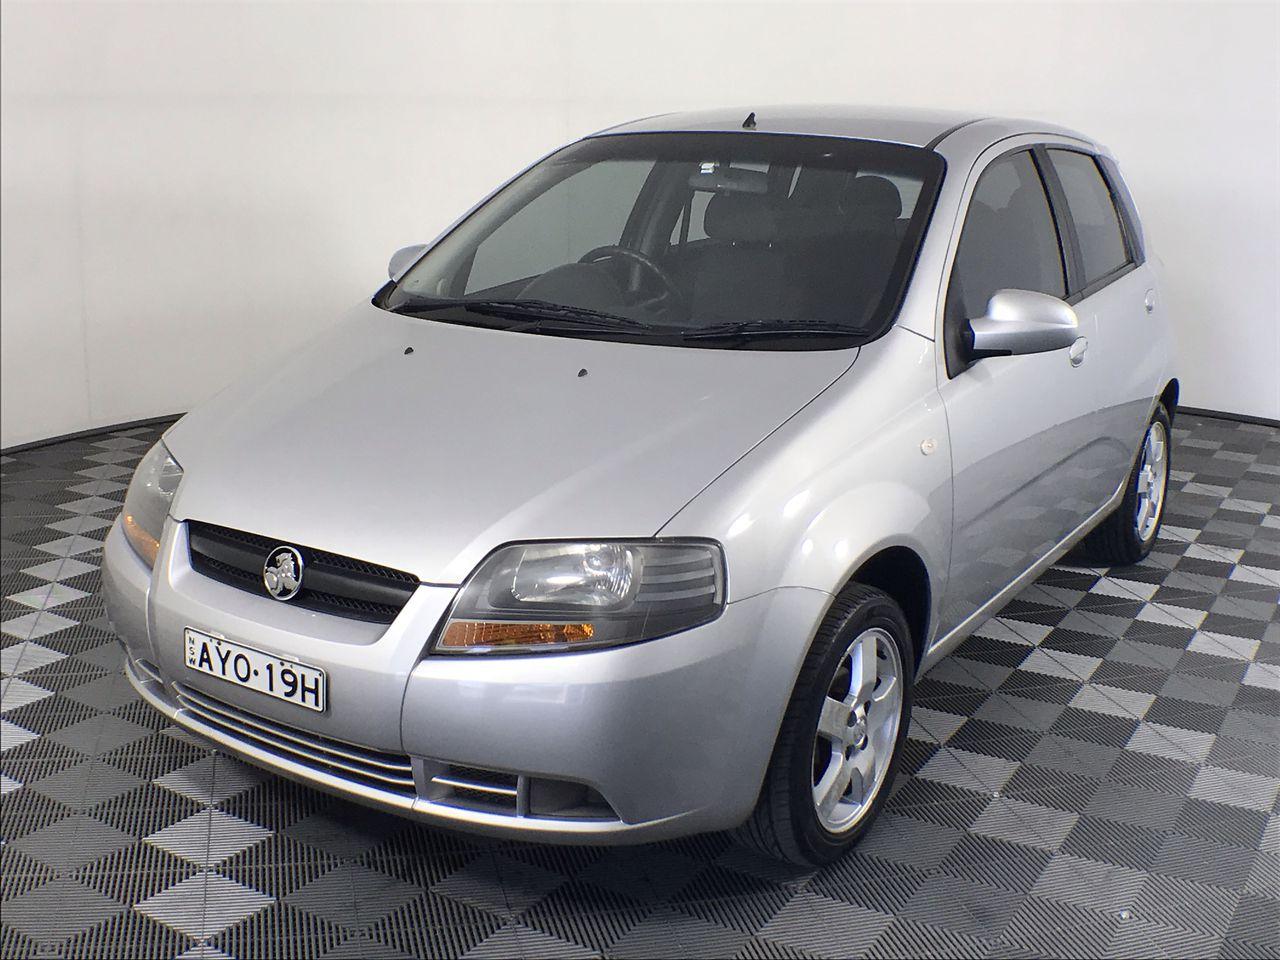 2006 Holden Barina TK Automatic Hatchback